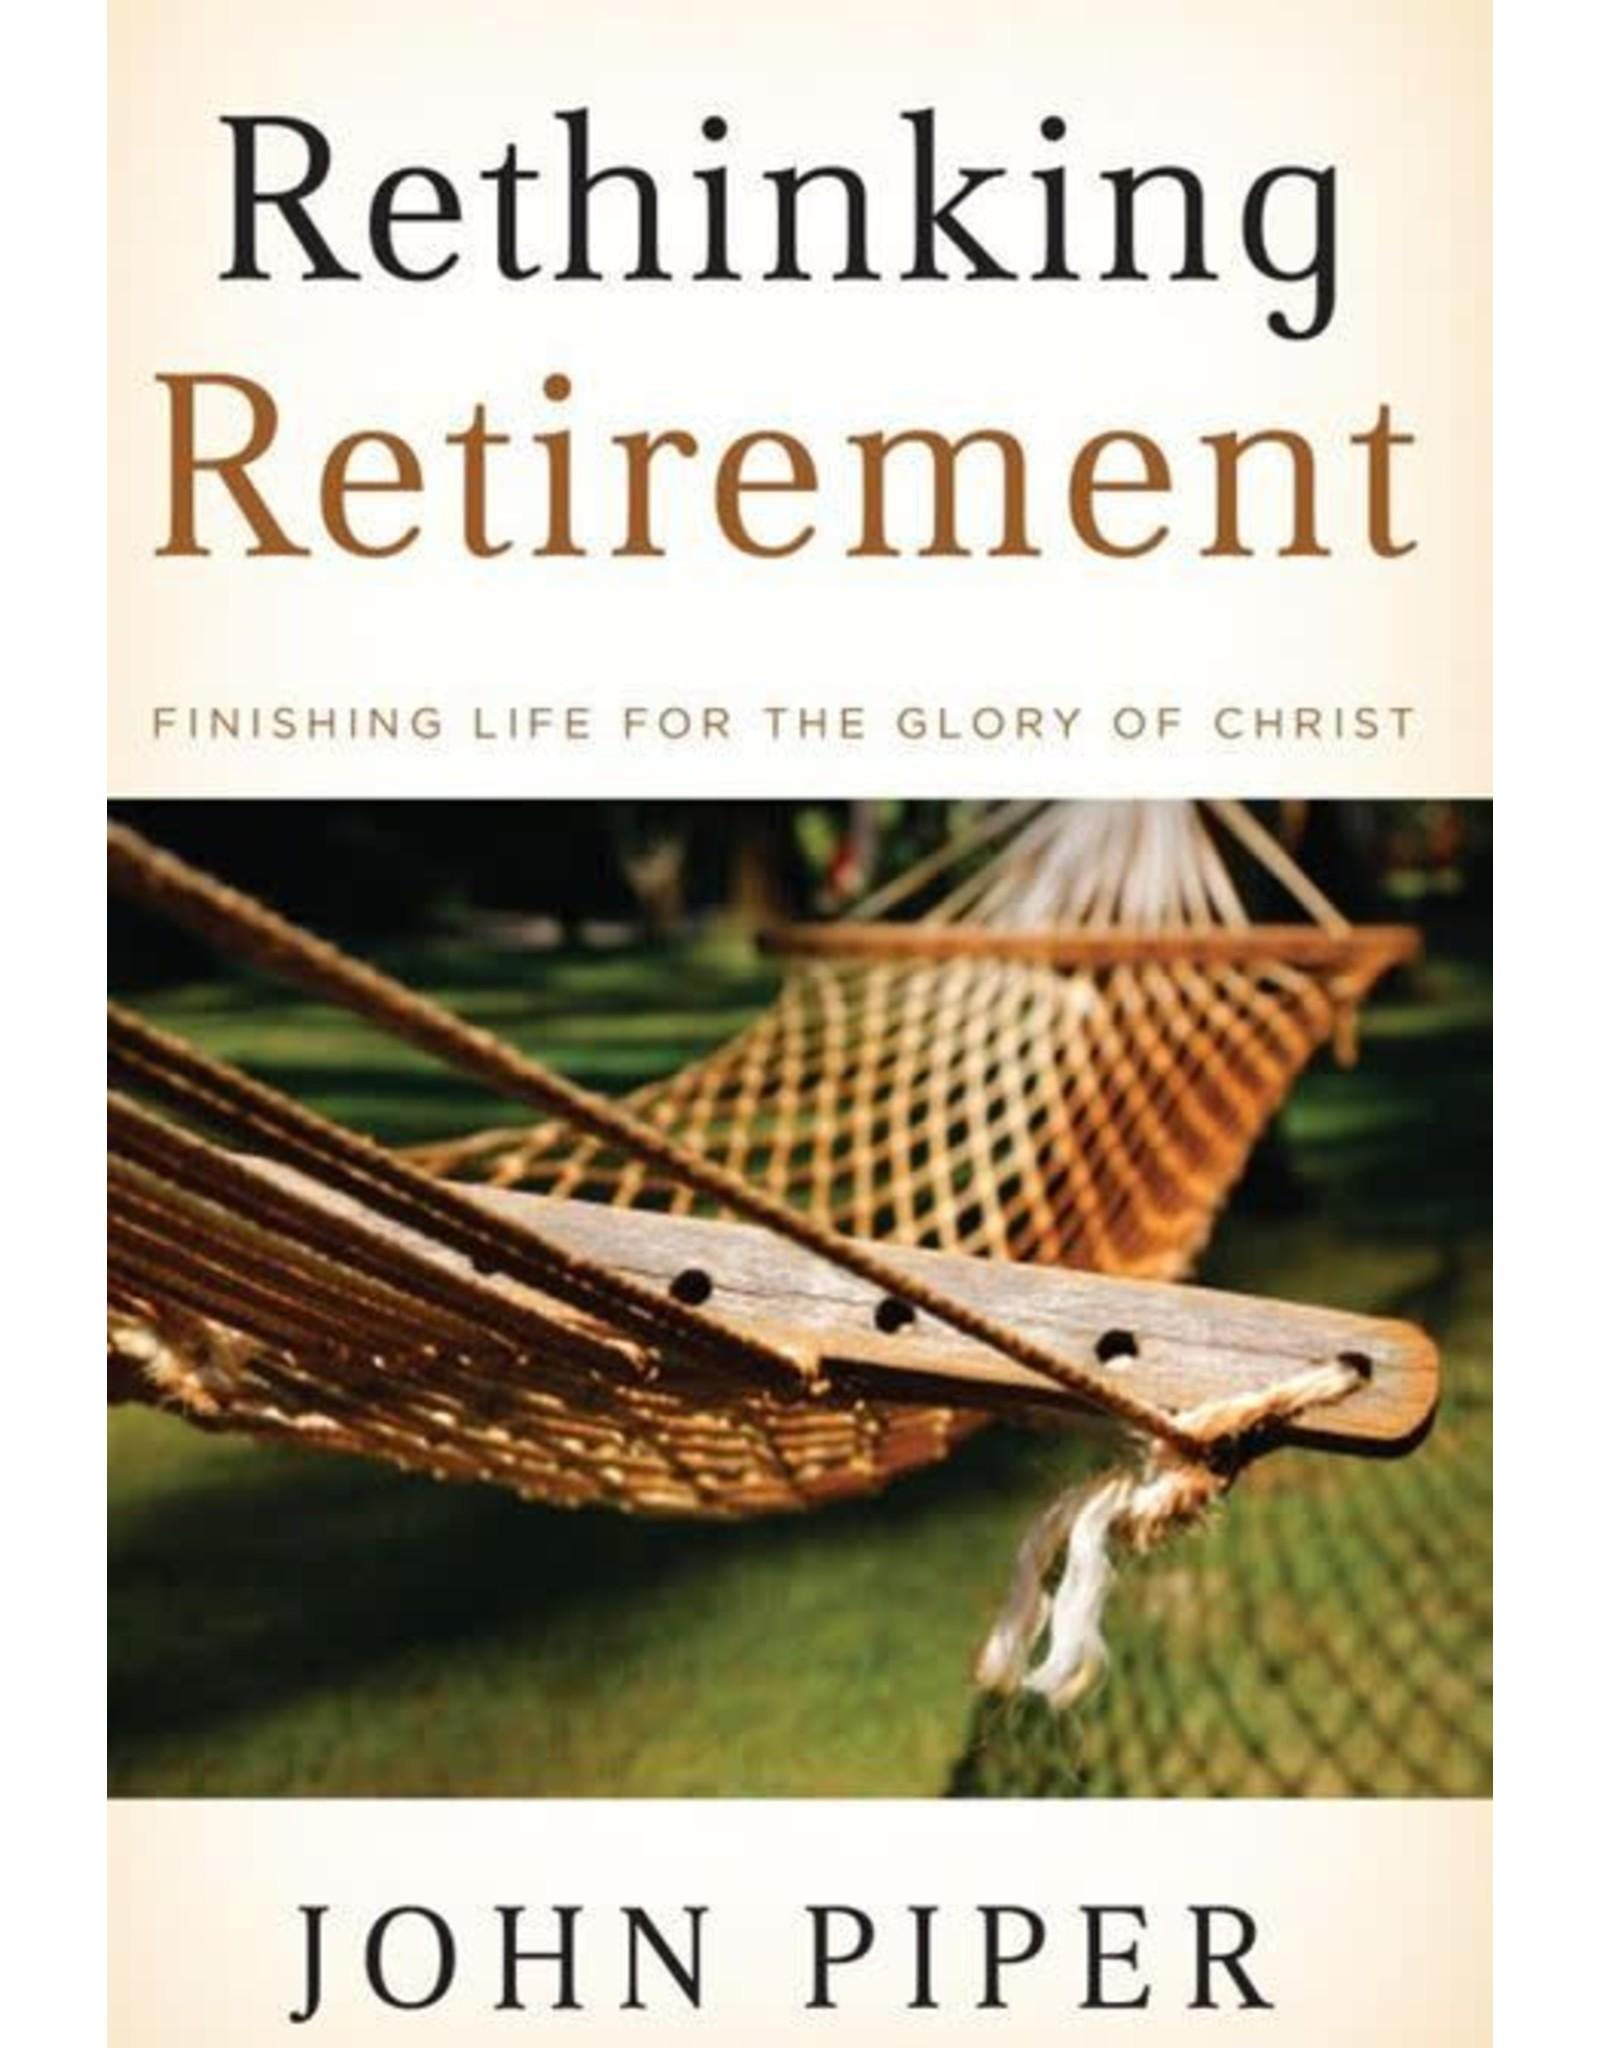 Hovel Audio Rethinking Retirement: Finishing Life For the Glory of Christ (Audio CD)